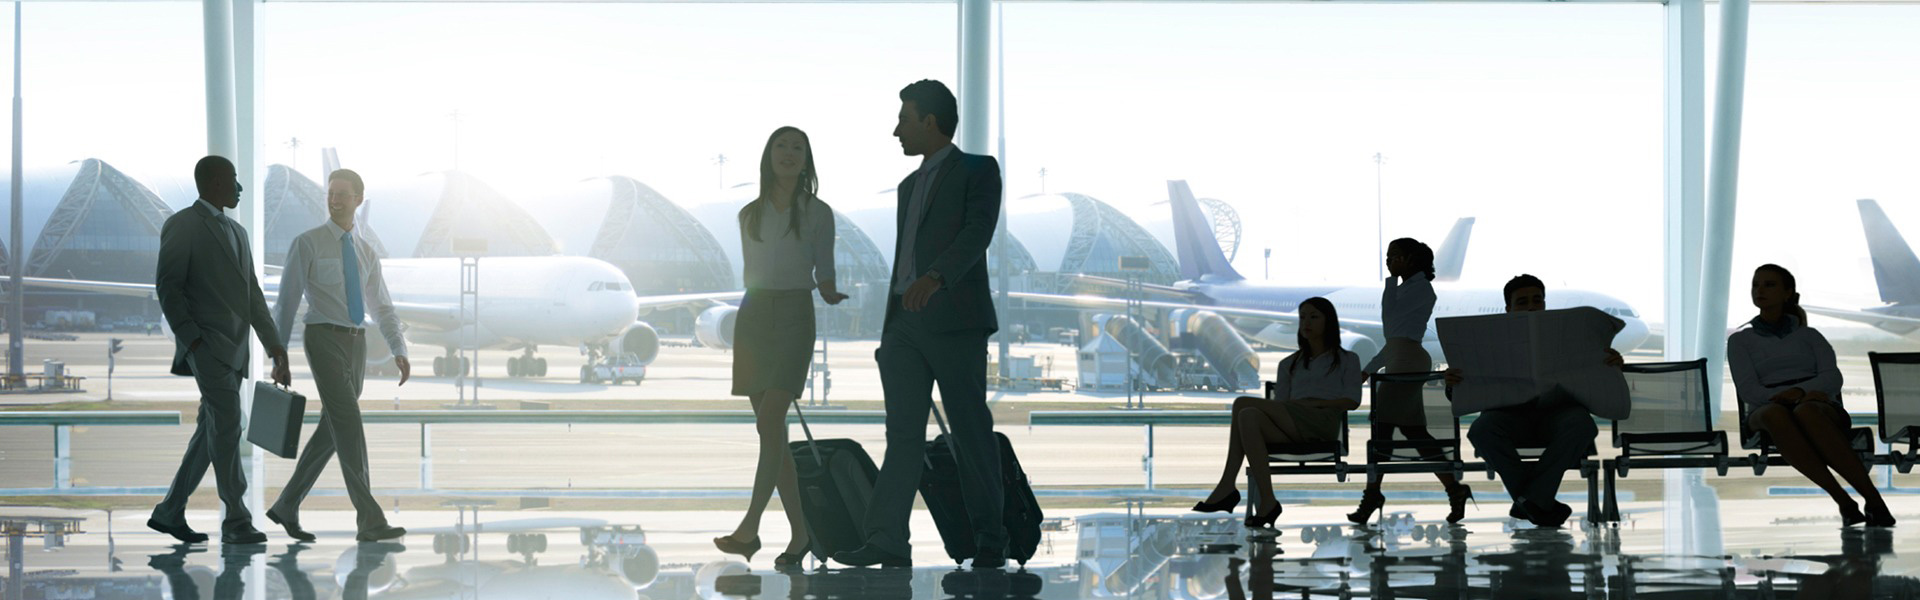 Airport reception